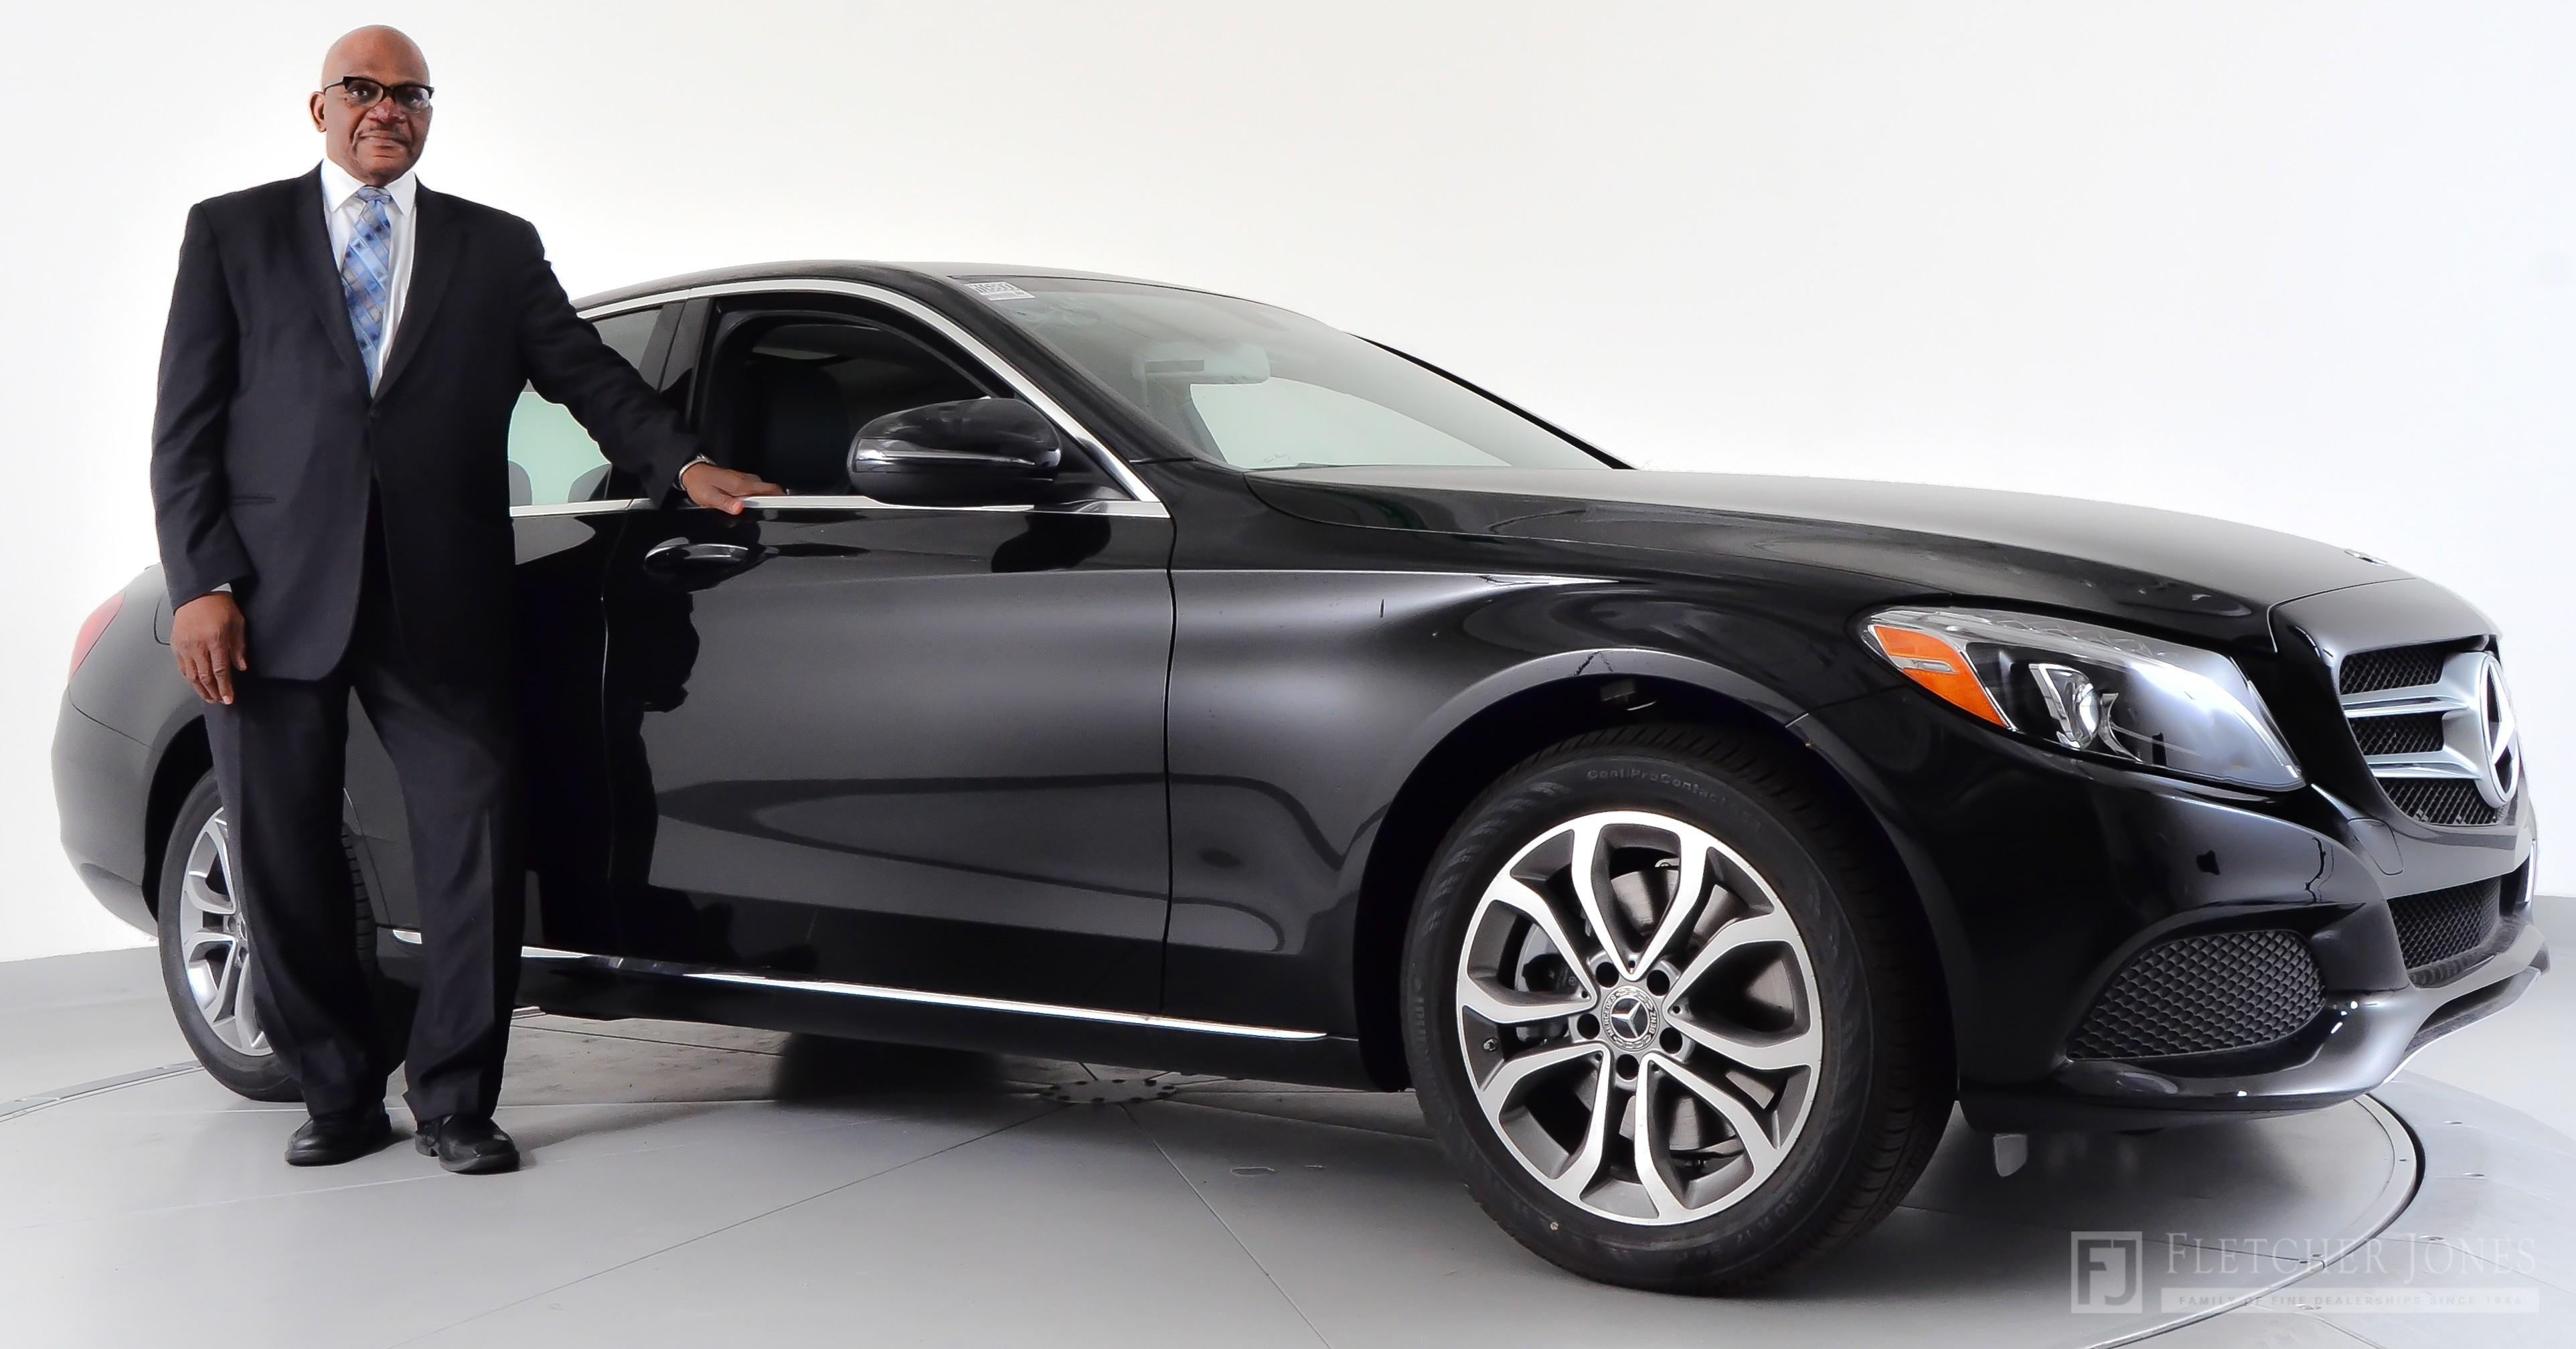 Jim Jordan standing next to a Mercedes-Benz C 300 Sedan